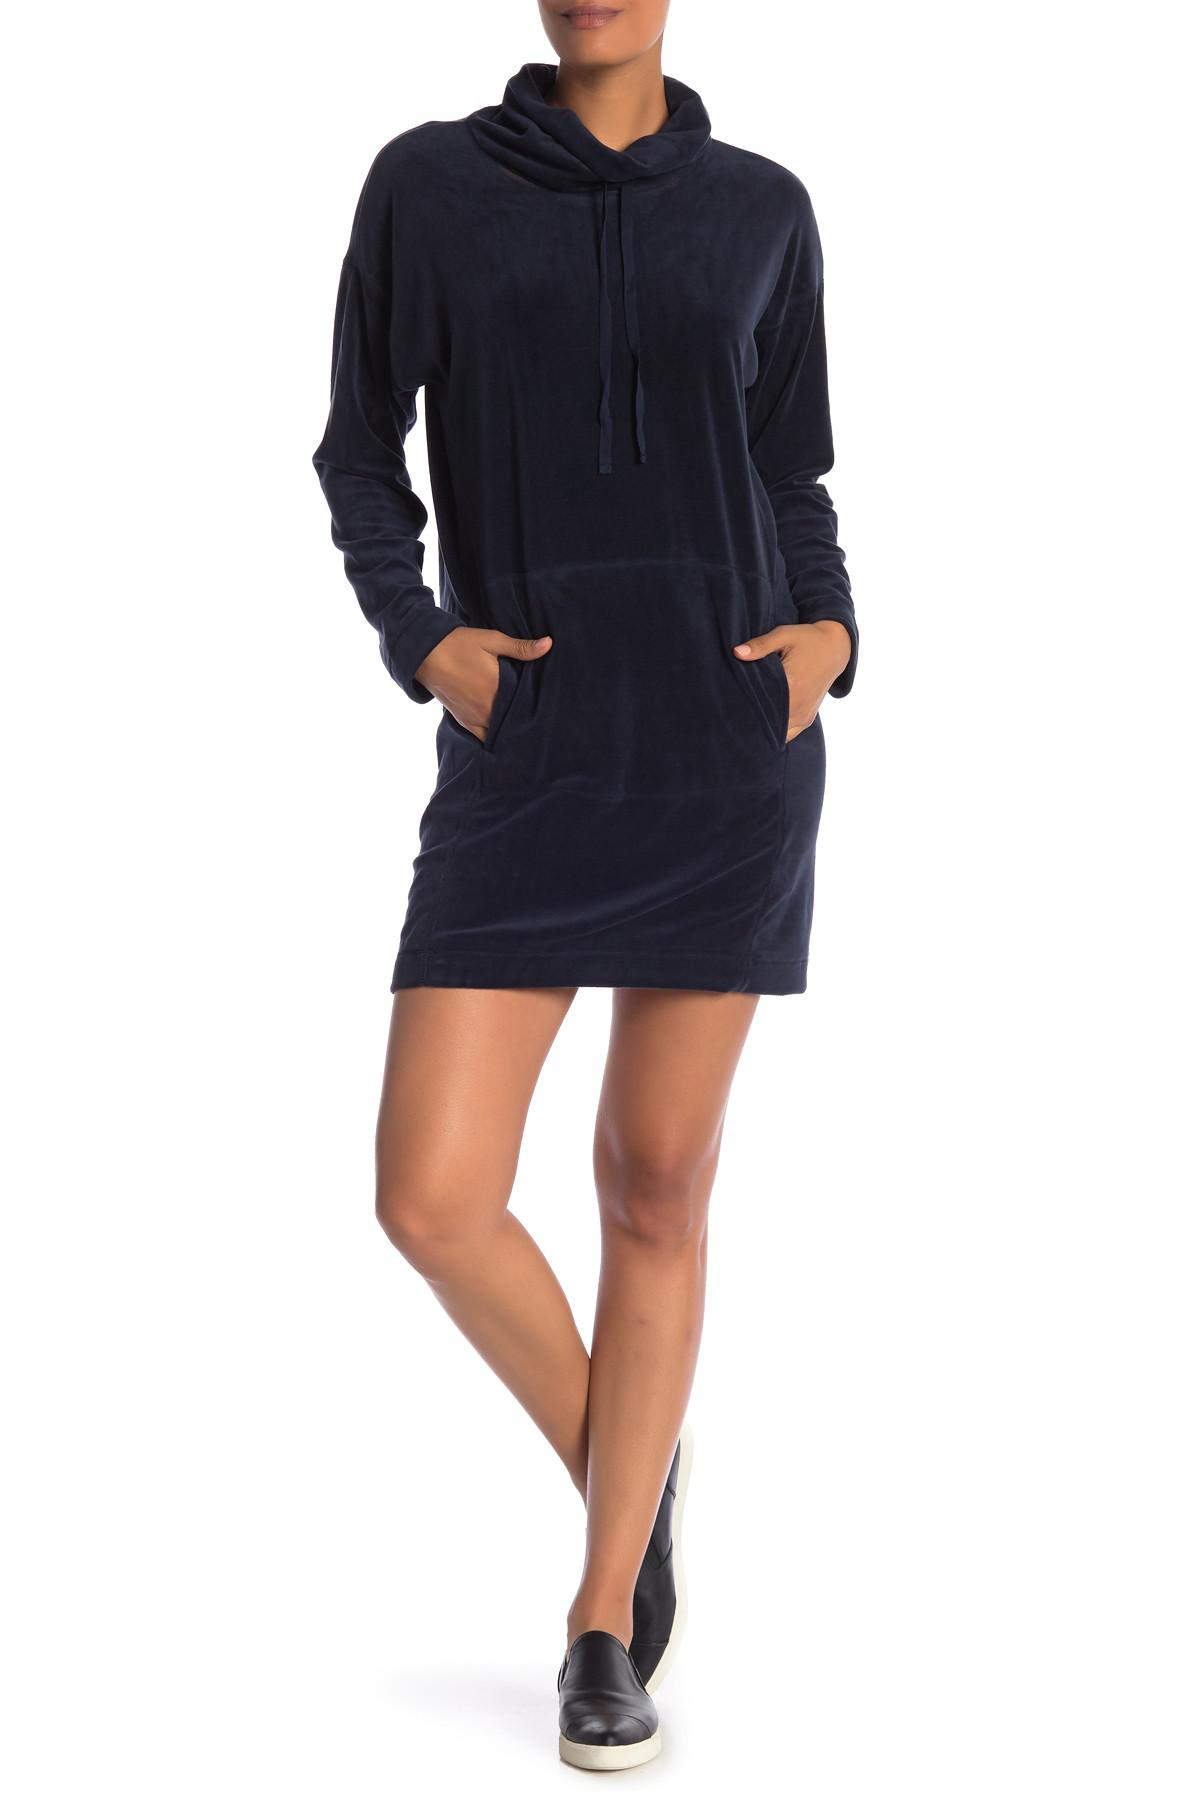 Banana Republic Sweater Dress Cowl Neck